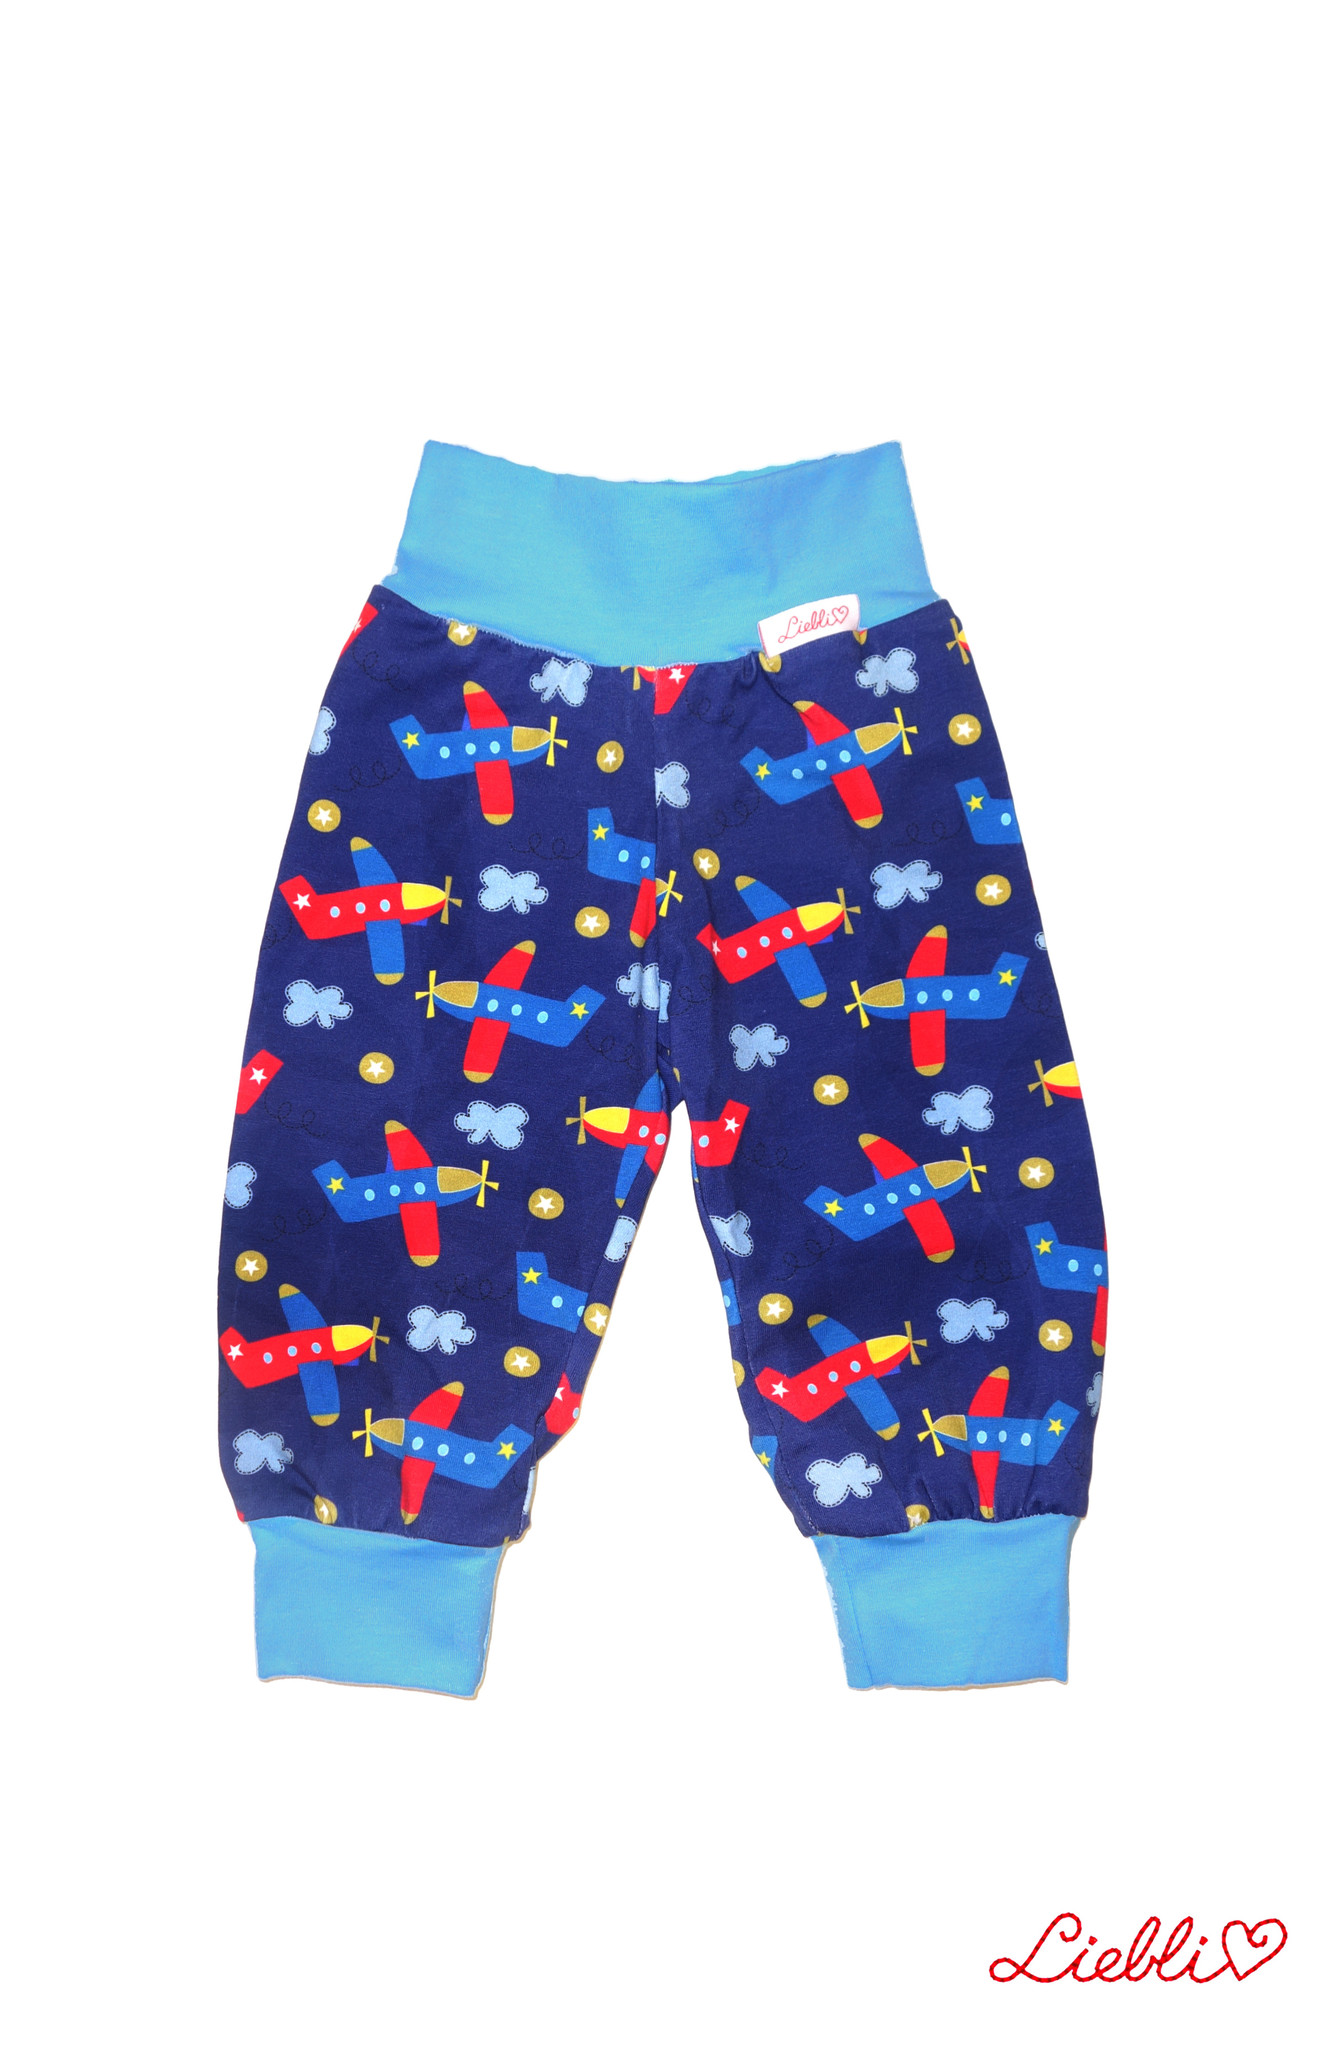 Kinderhose, Flugzeuge, Flieger, blau-türkis-rot